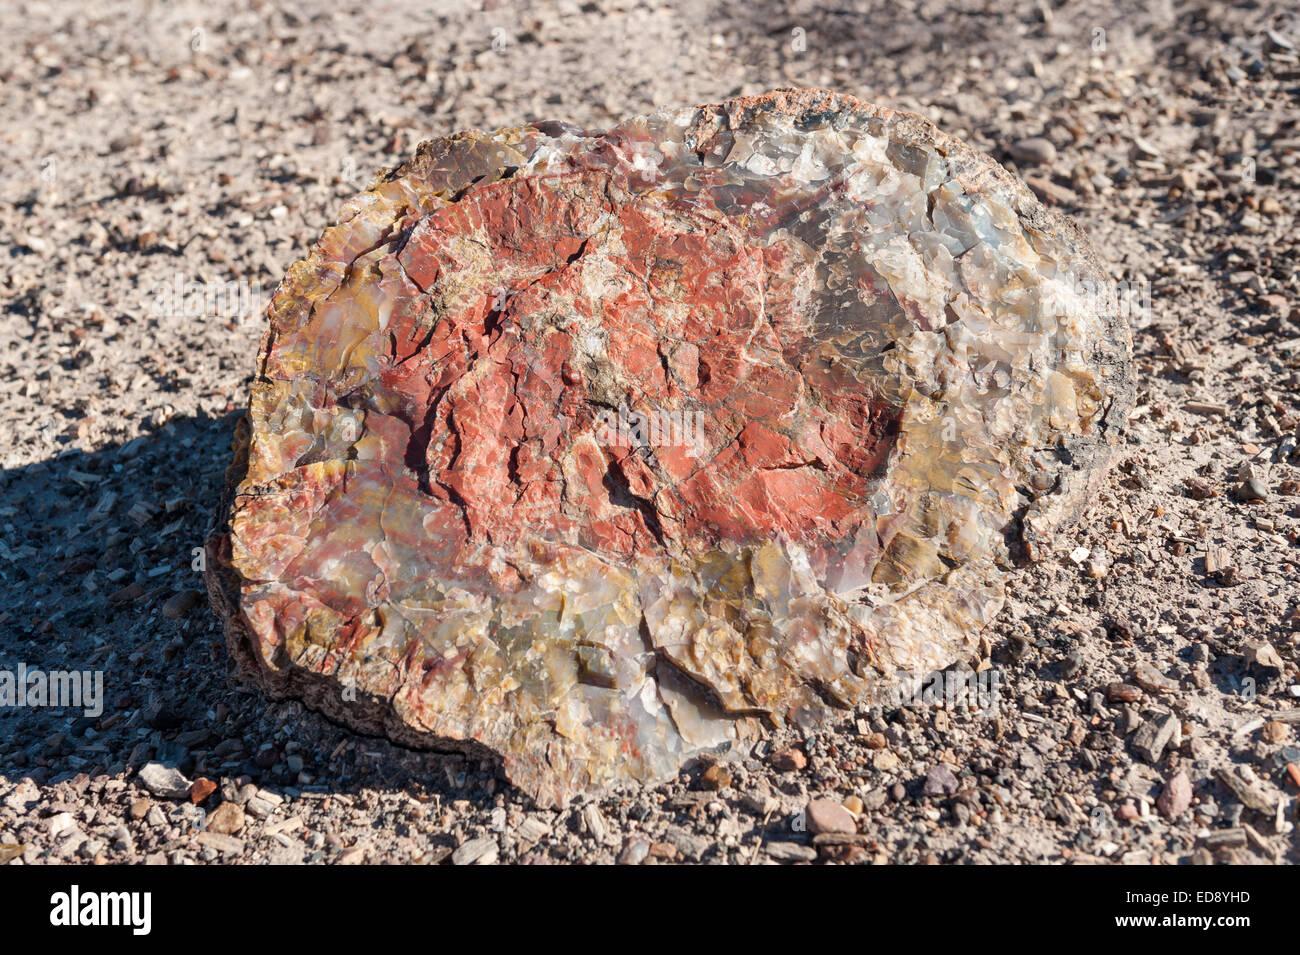 Segment of colourful petrified wood, Petrified Forest National Park, Arizona, US - Stock Image